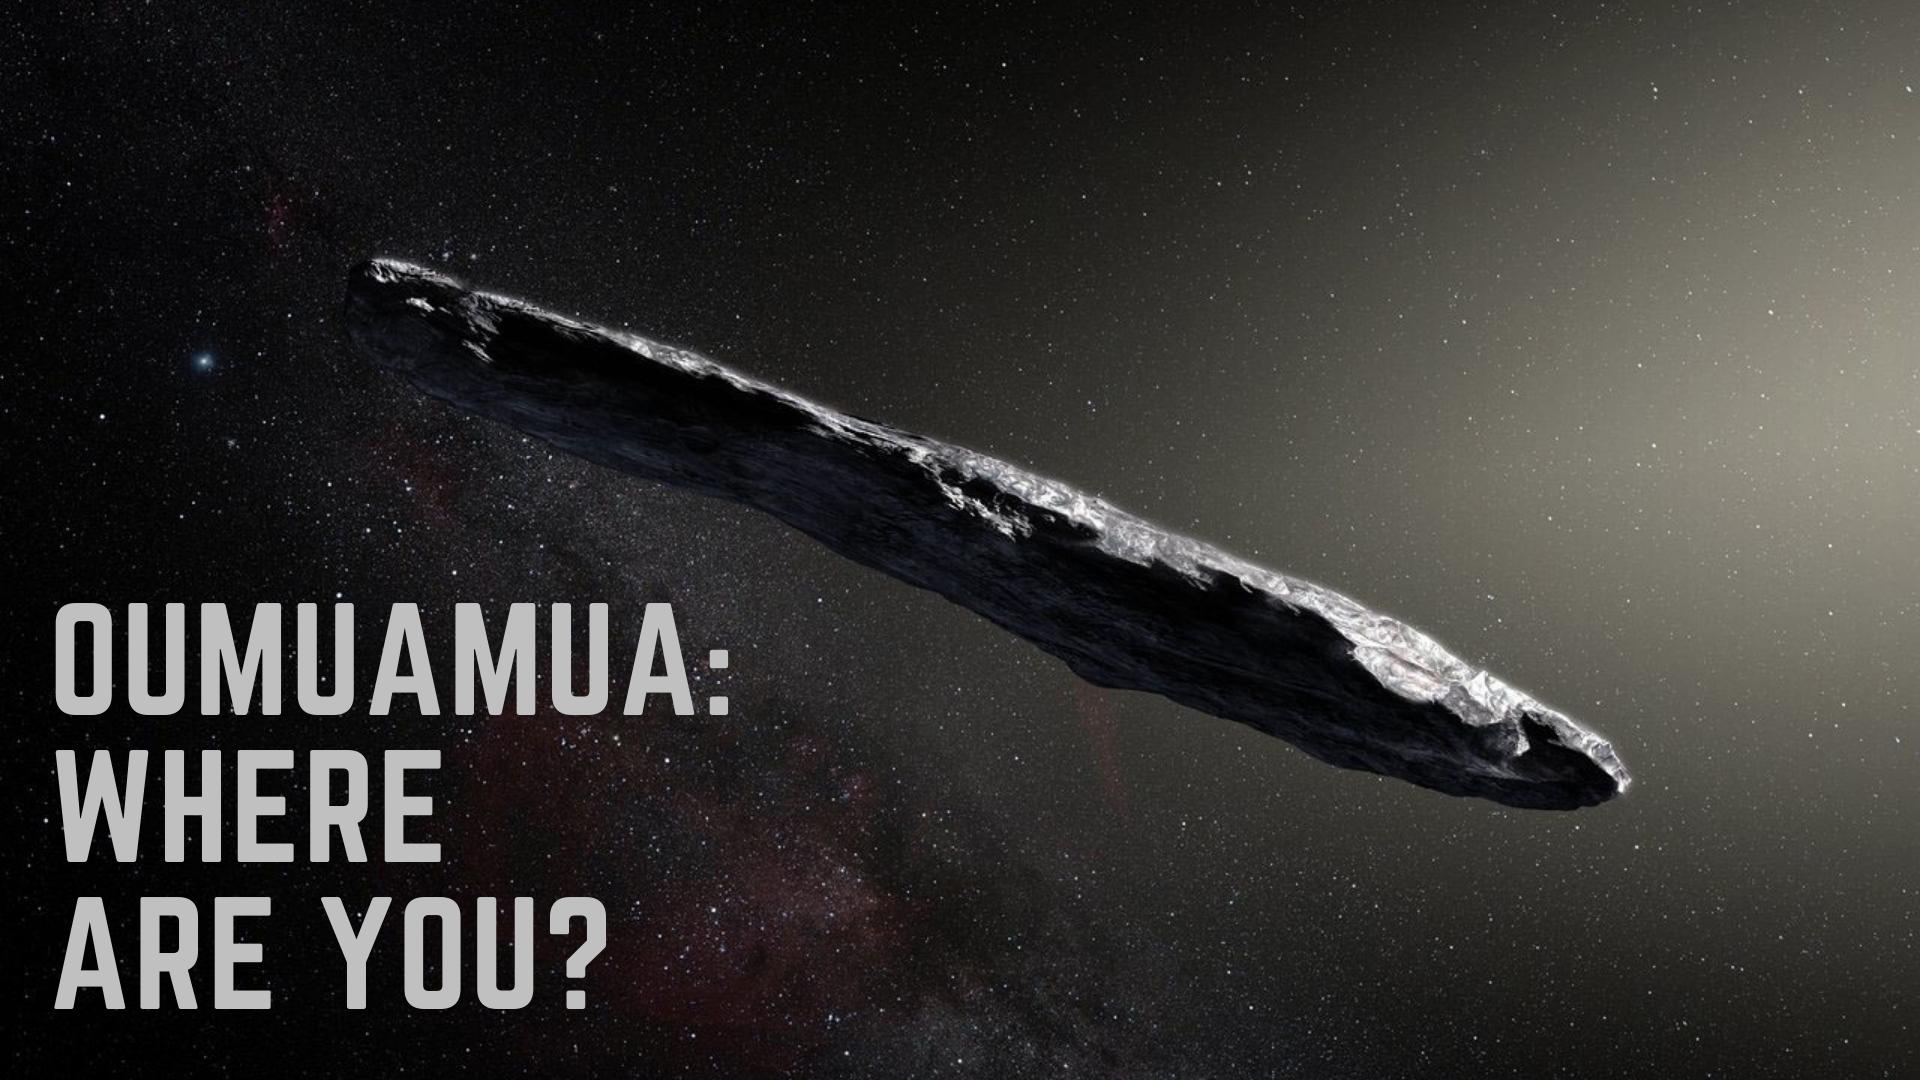 Thumbnail for Ep. #417: Oumuamua: Where Are You? w/ Avi Loeb